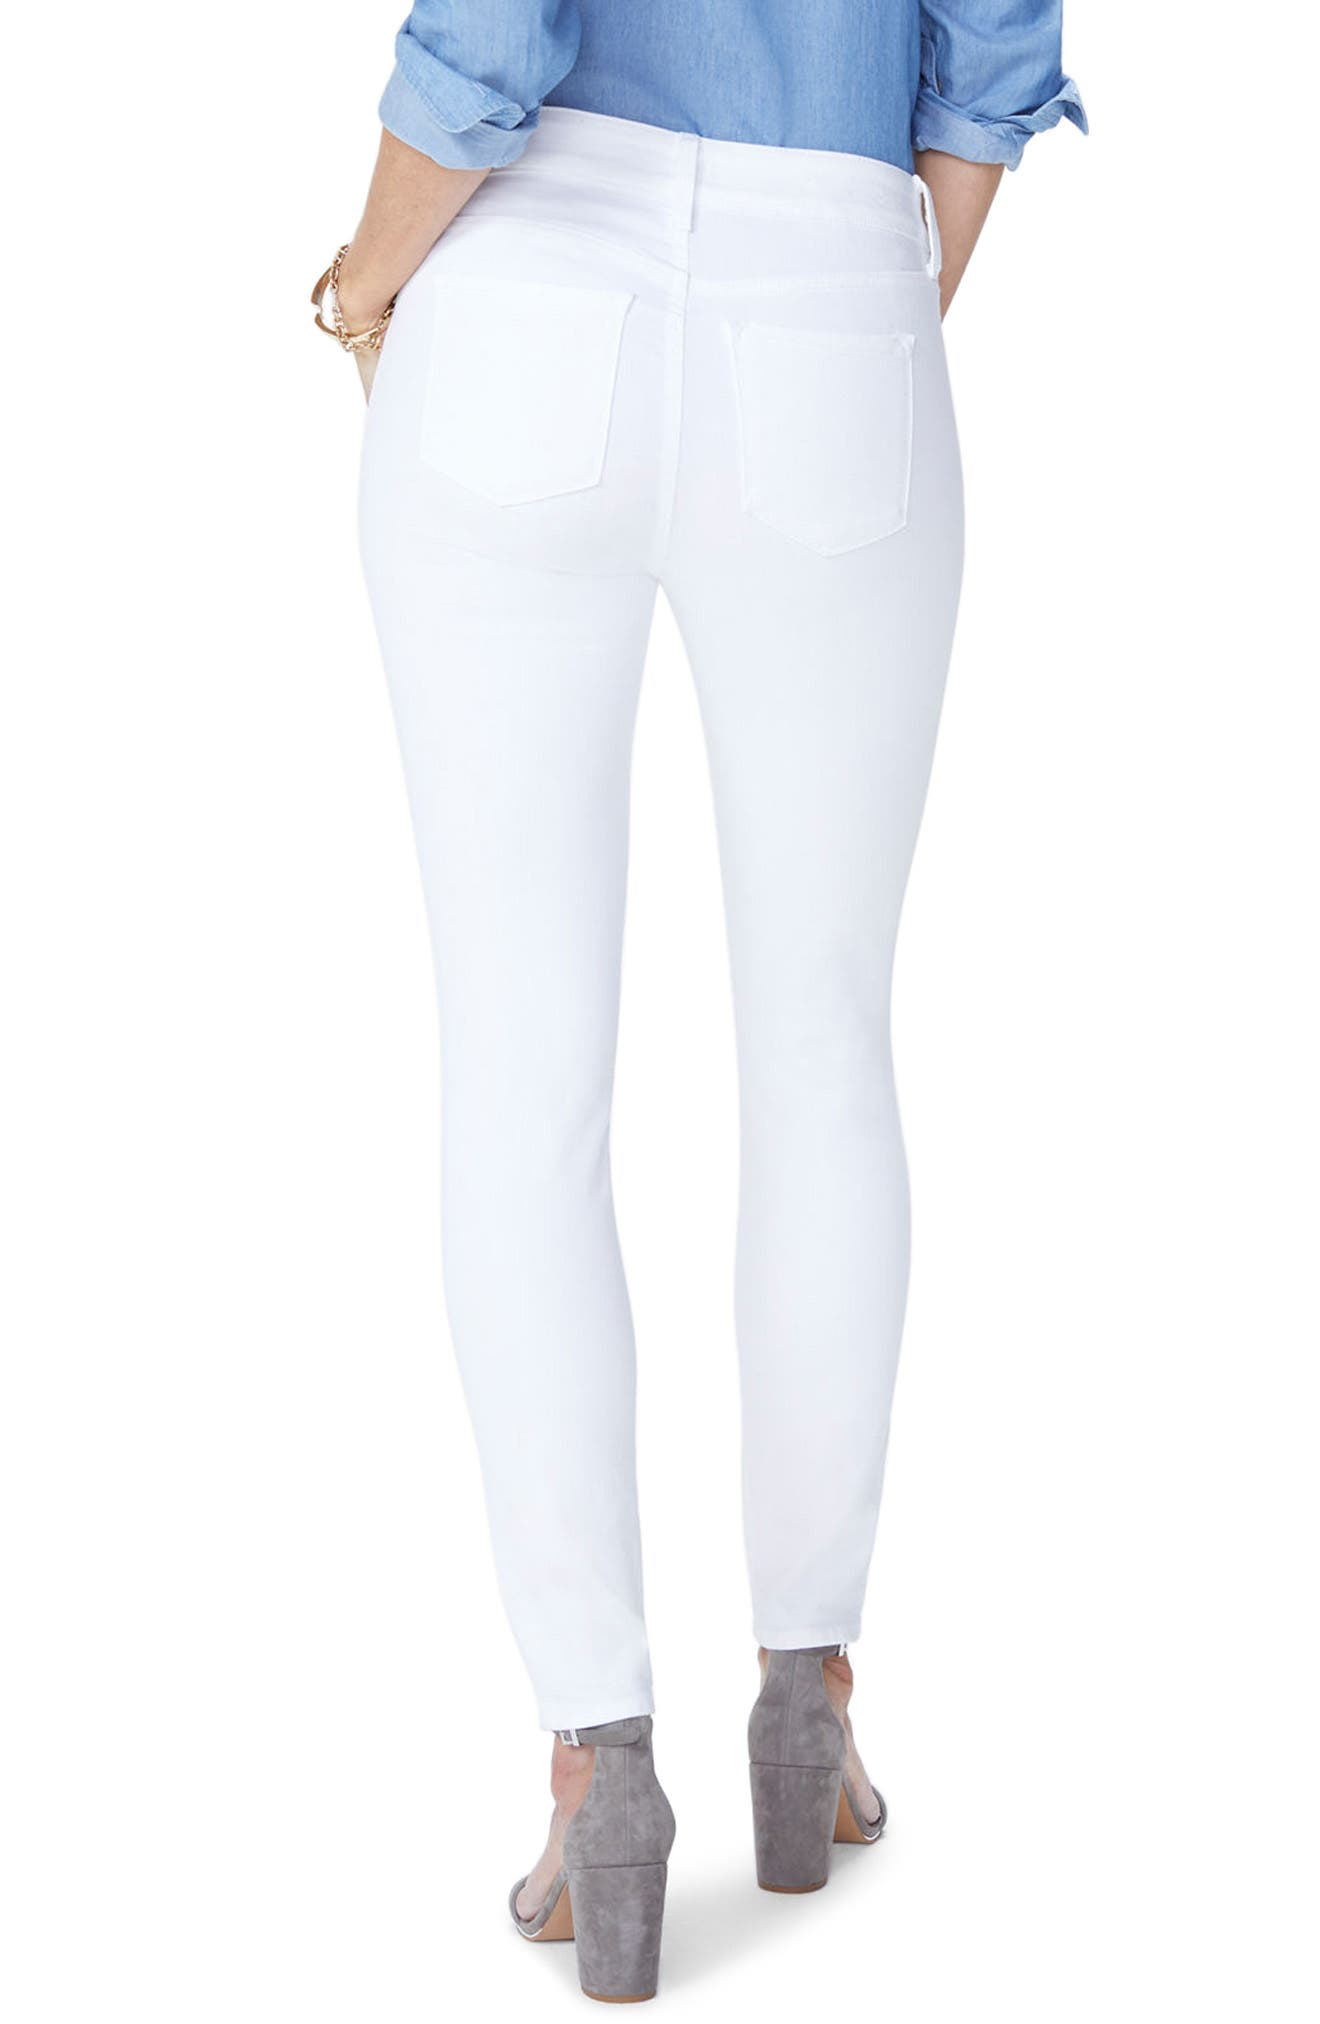 NYDJ, Ami Ankle Skinny Jeans, Alternate thumbnail 2, color, OPTIC WHITE